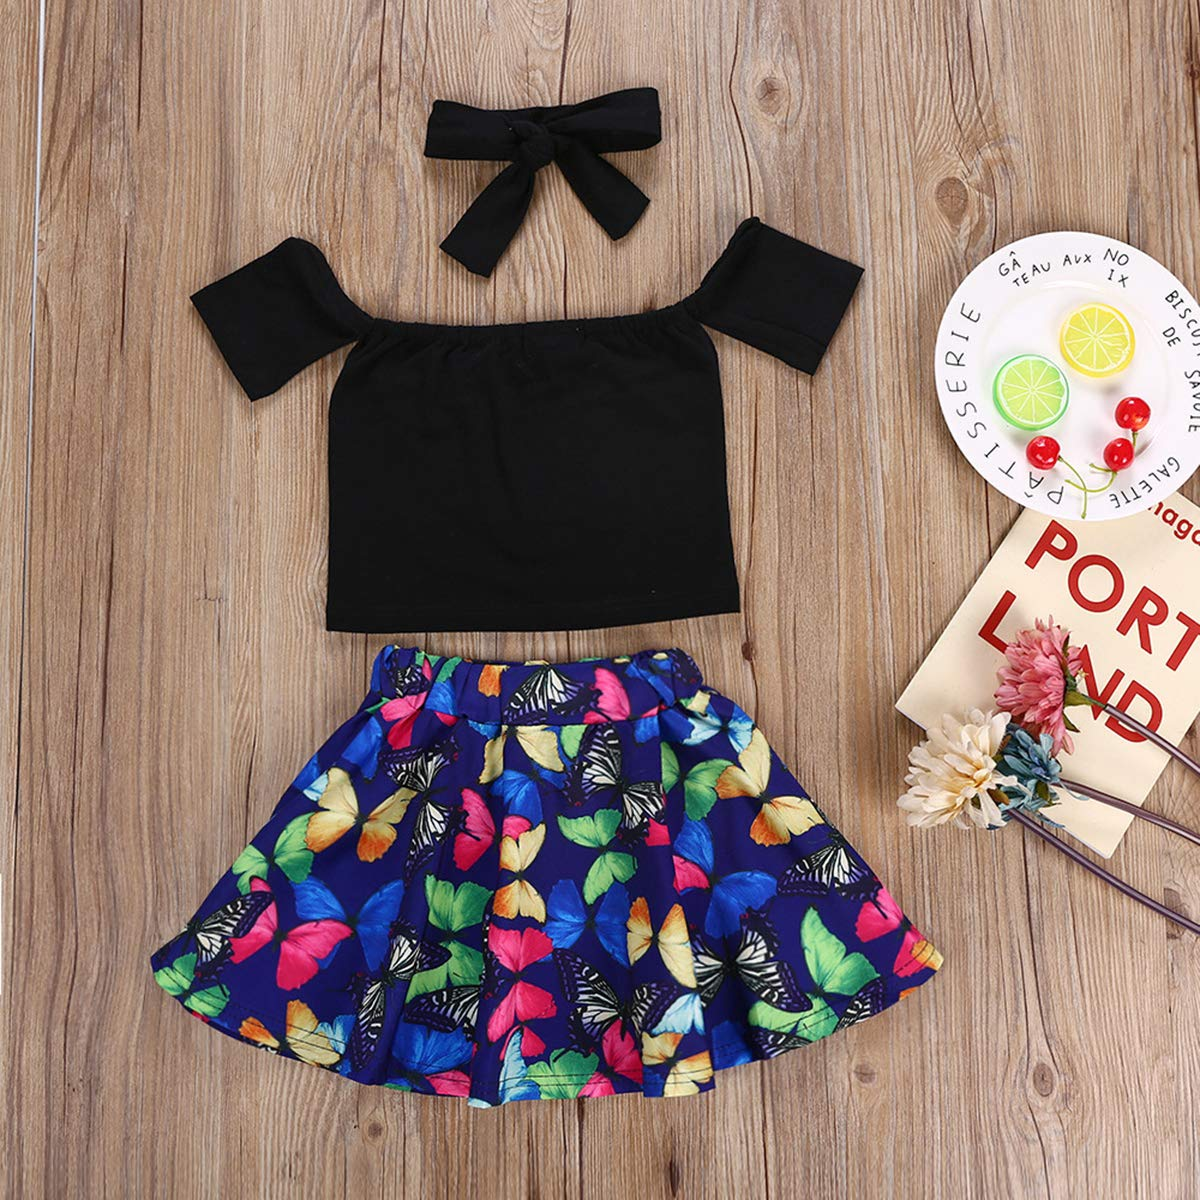 Headband Skirt NOMSOCR Toddler Kids Baby Girls 3Pcs Outfit Clothes Set Off Shoulder Top